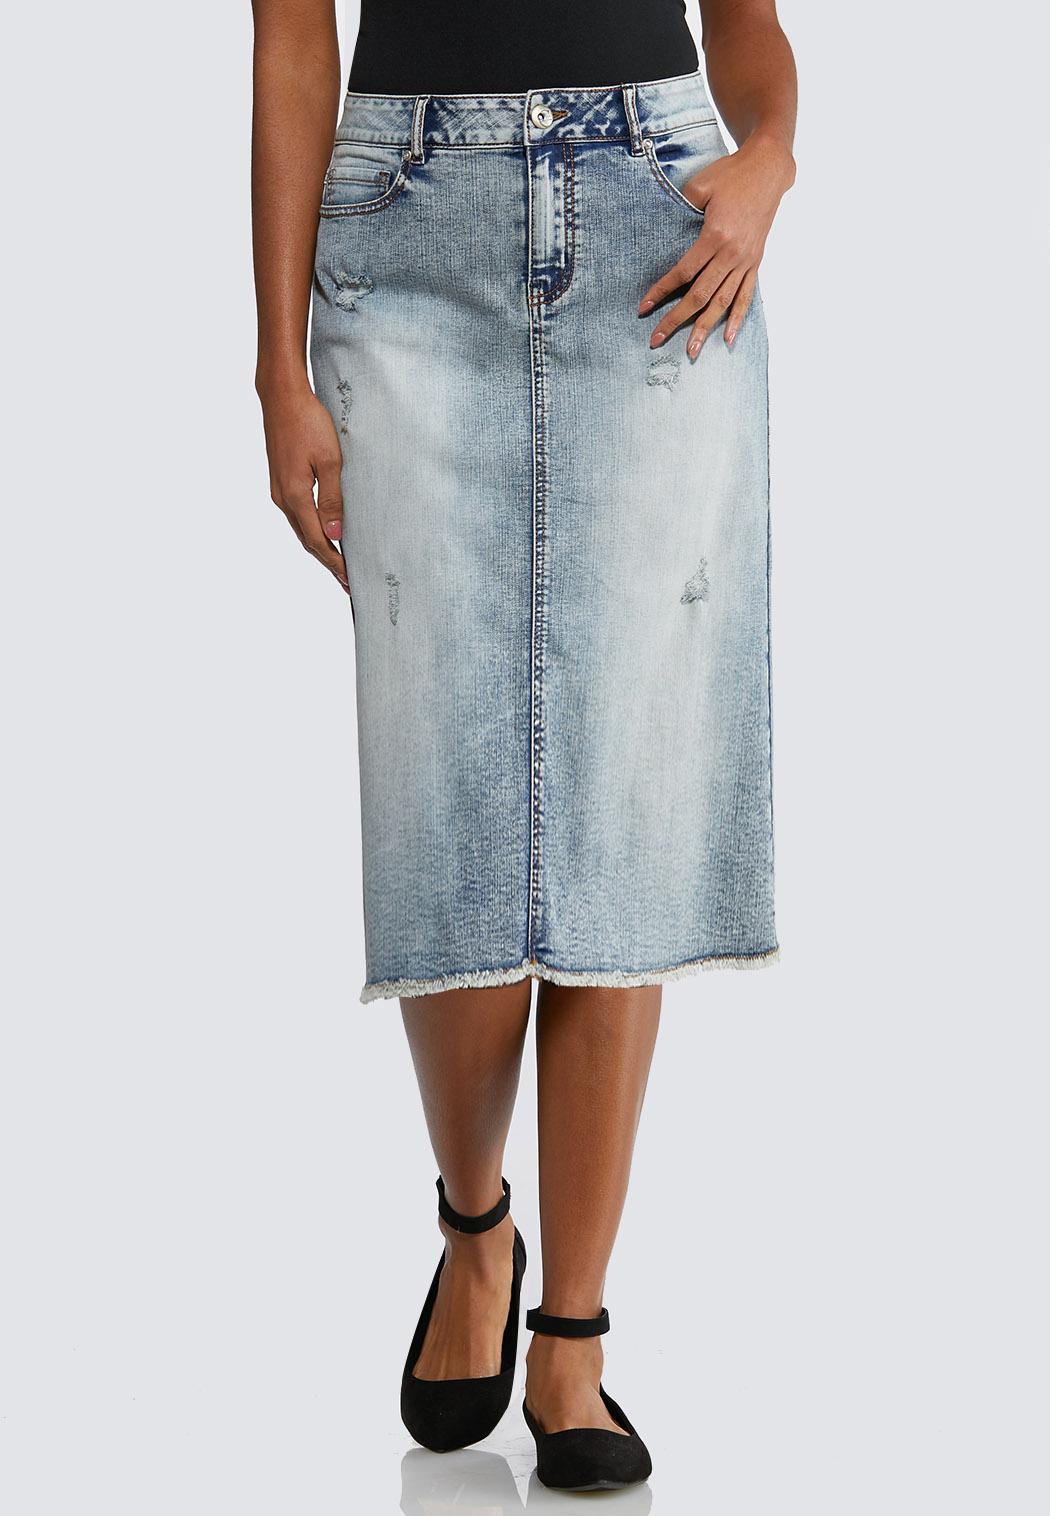 Plus Size Distressed Faded Denim Skirt